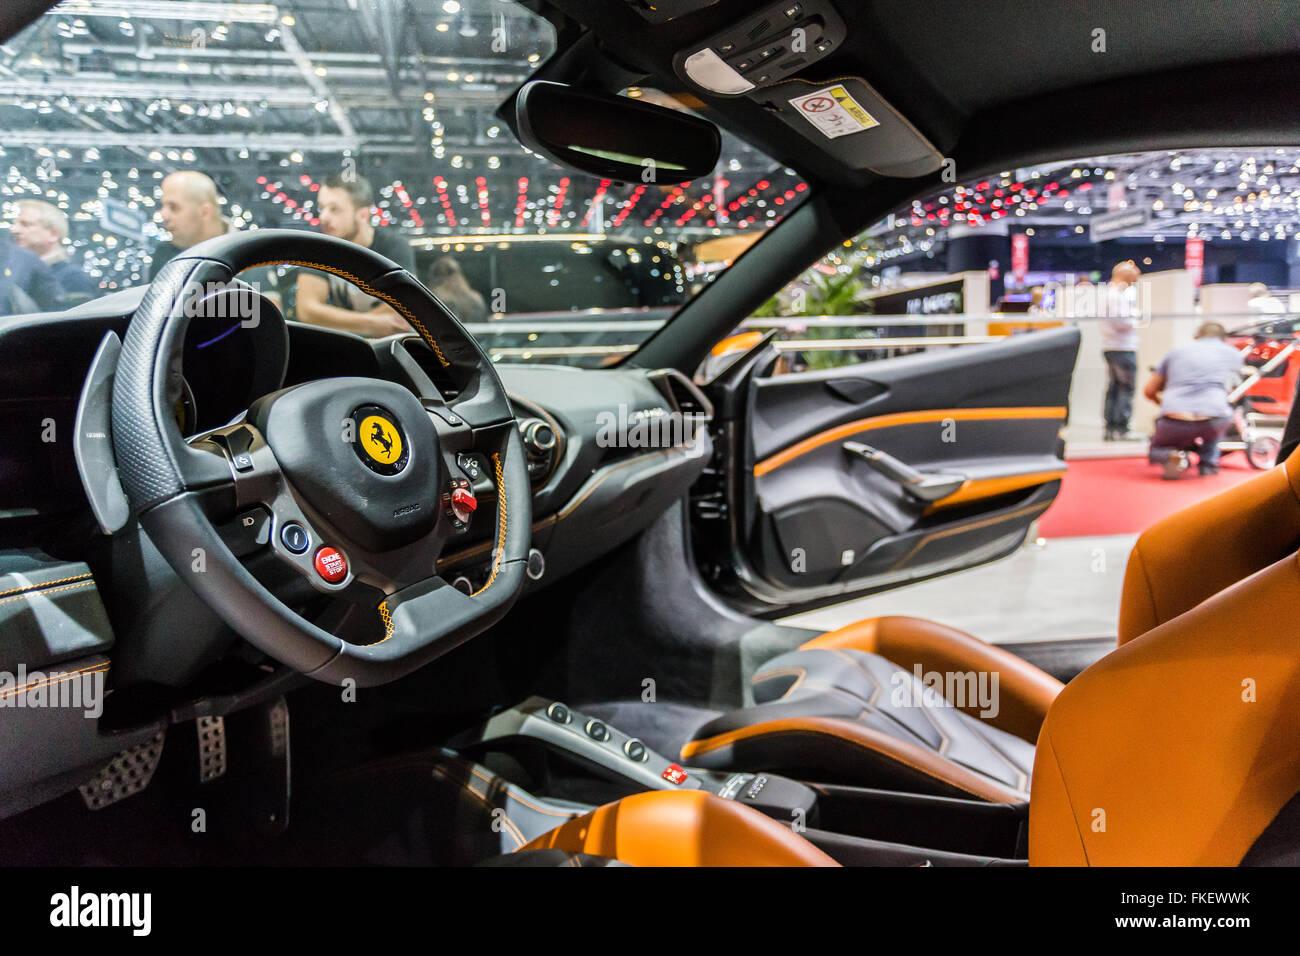 car show in Geneva in 2016, Ferrari - Stock Image